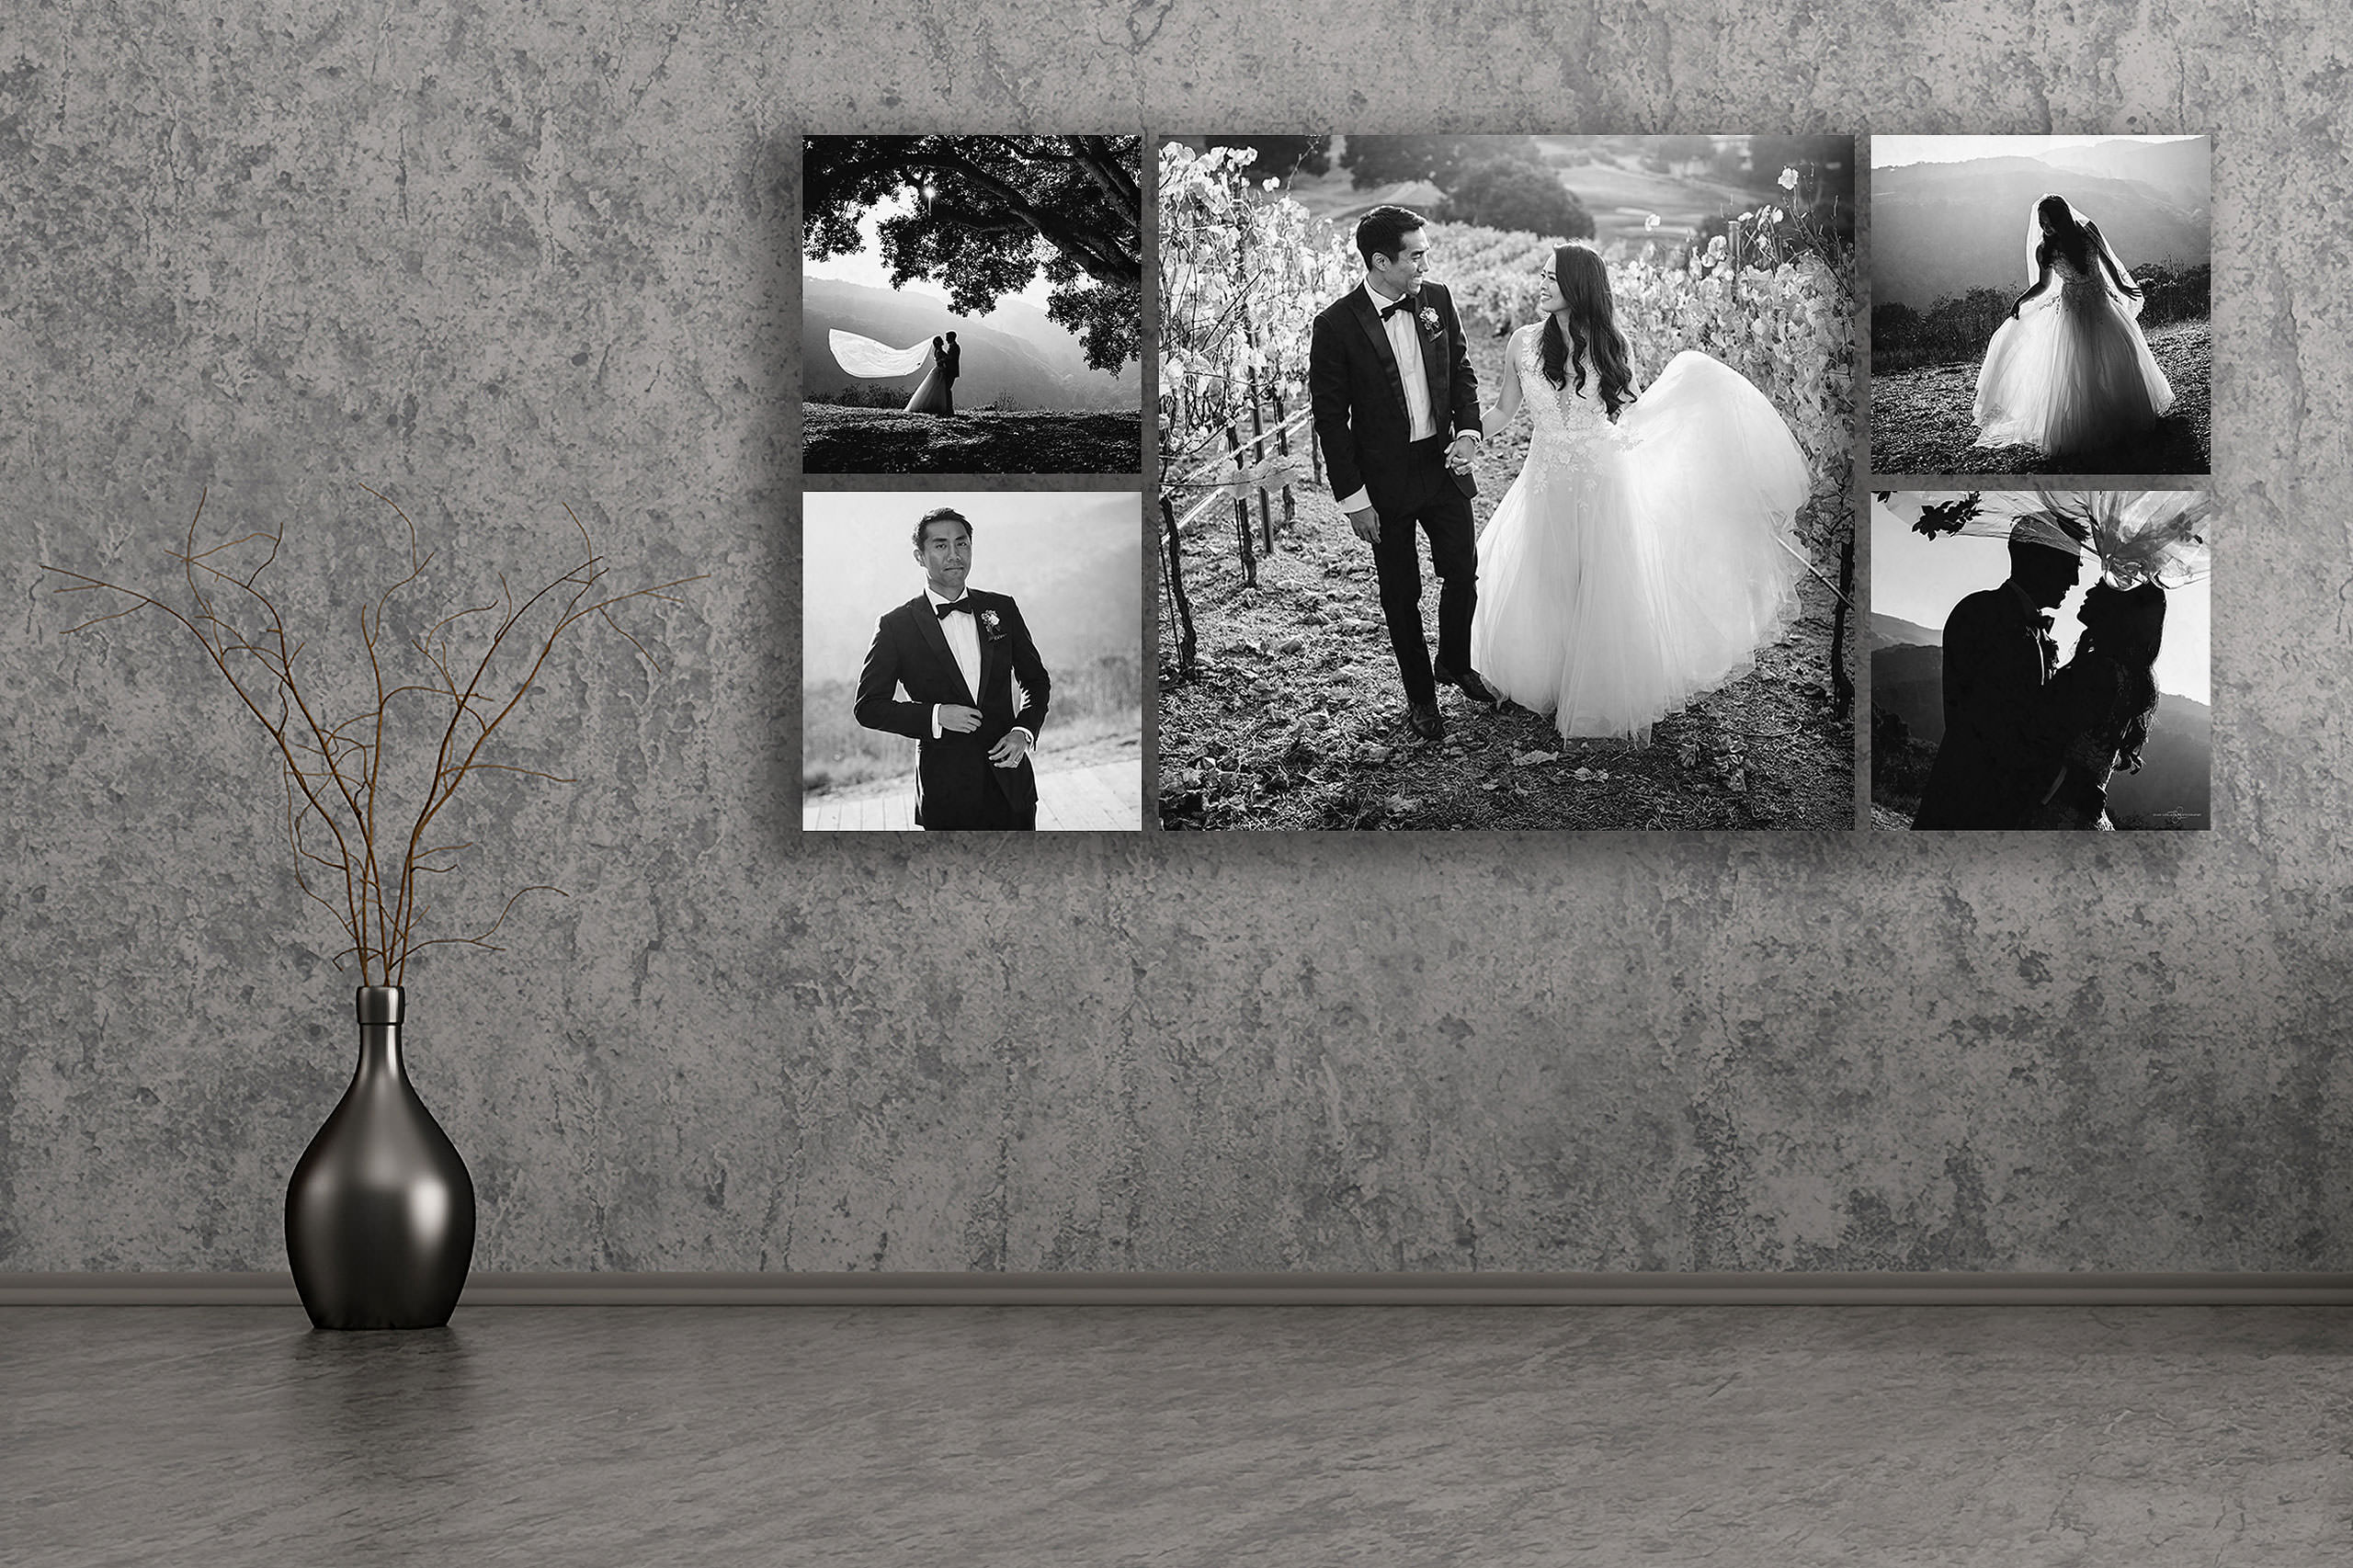 Wall art collection by Carmel Valley Ranch Wedding Photographer Sean LeBlanc